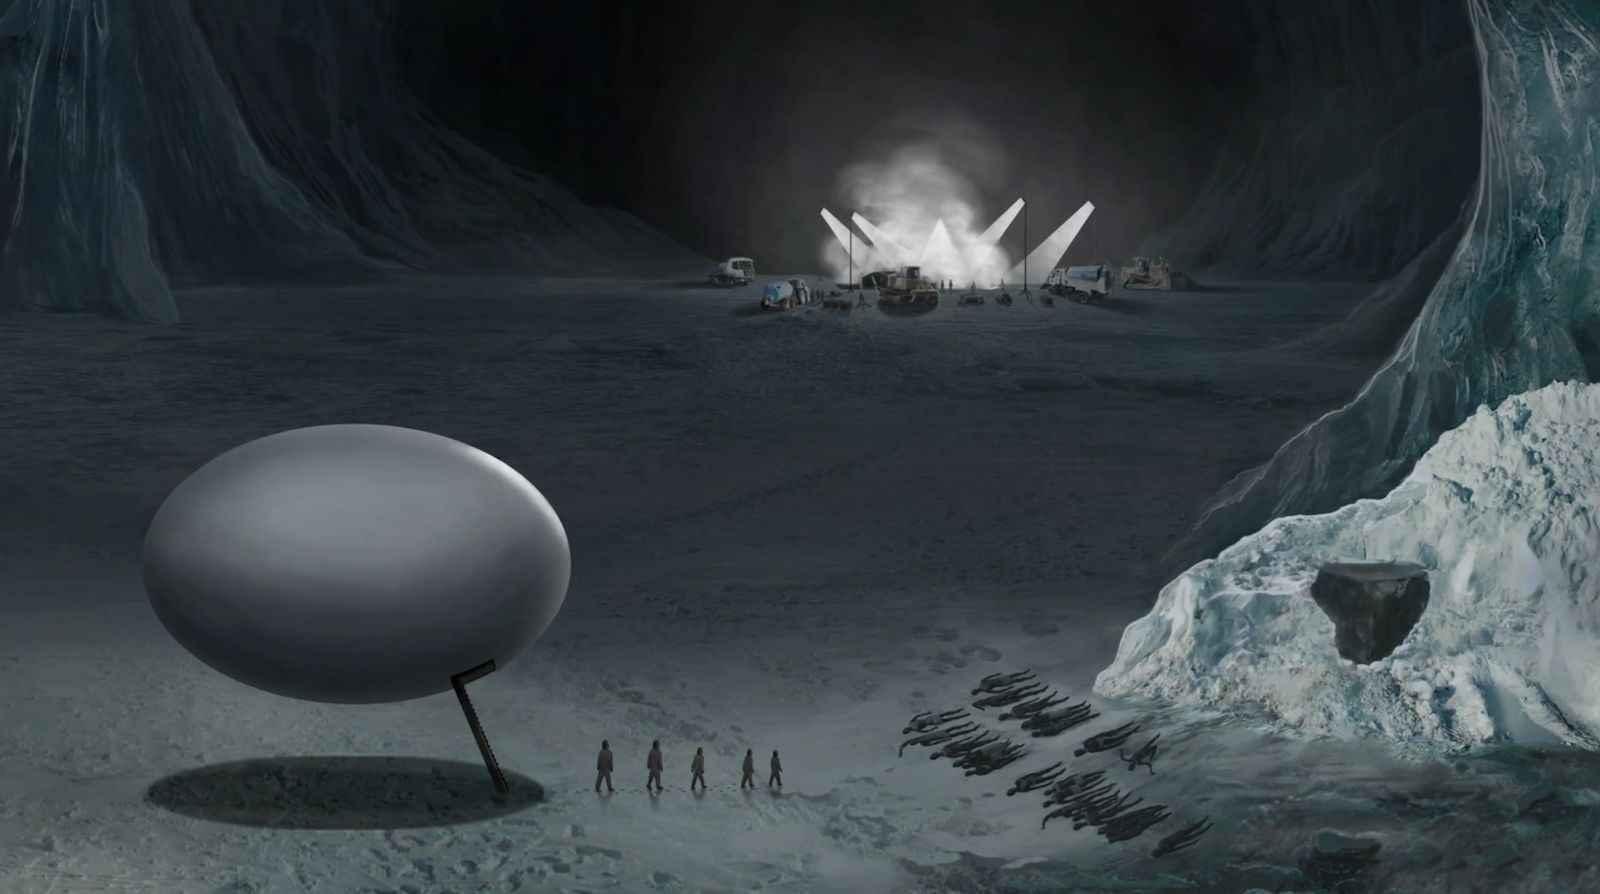 http://stopmensonges.com/wp-content/uploads/2017/05/12_Anshar_egg_shaped_craft_in_Antarctica.jpg